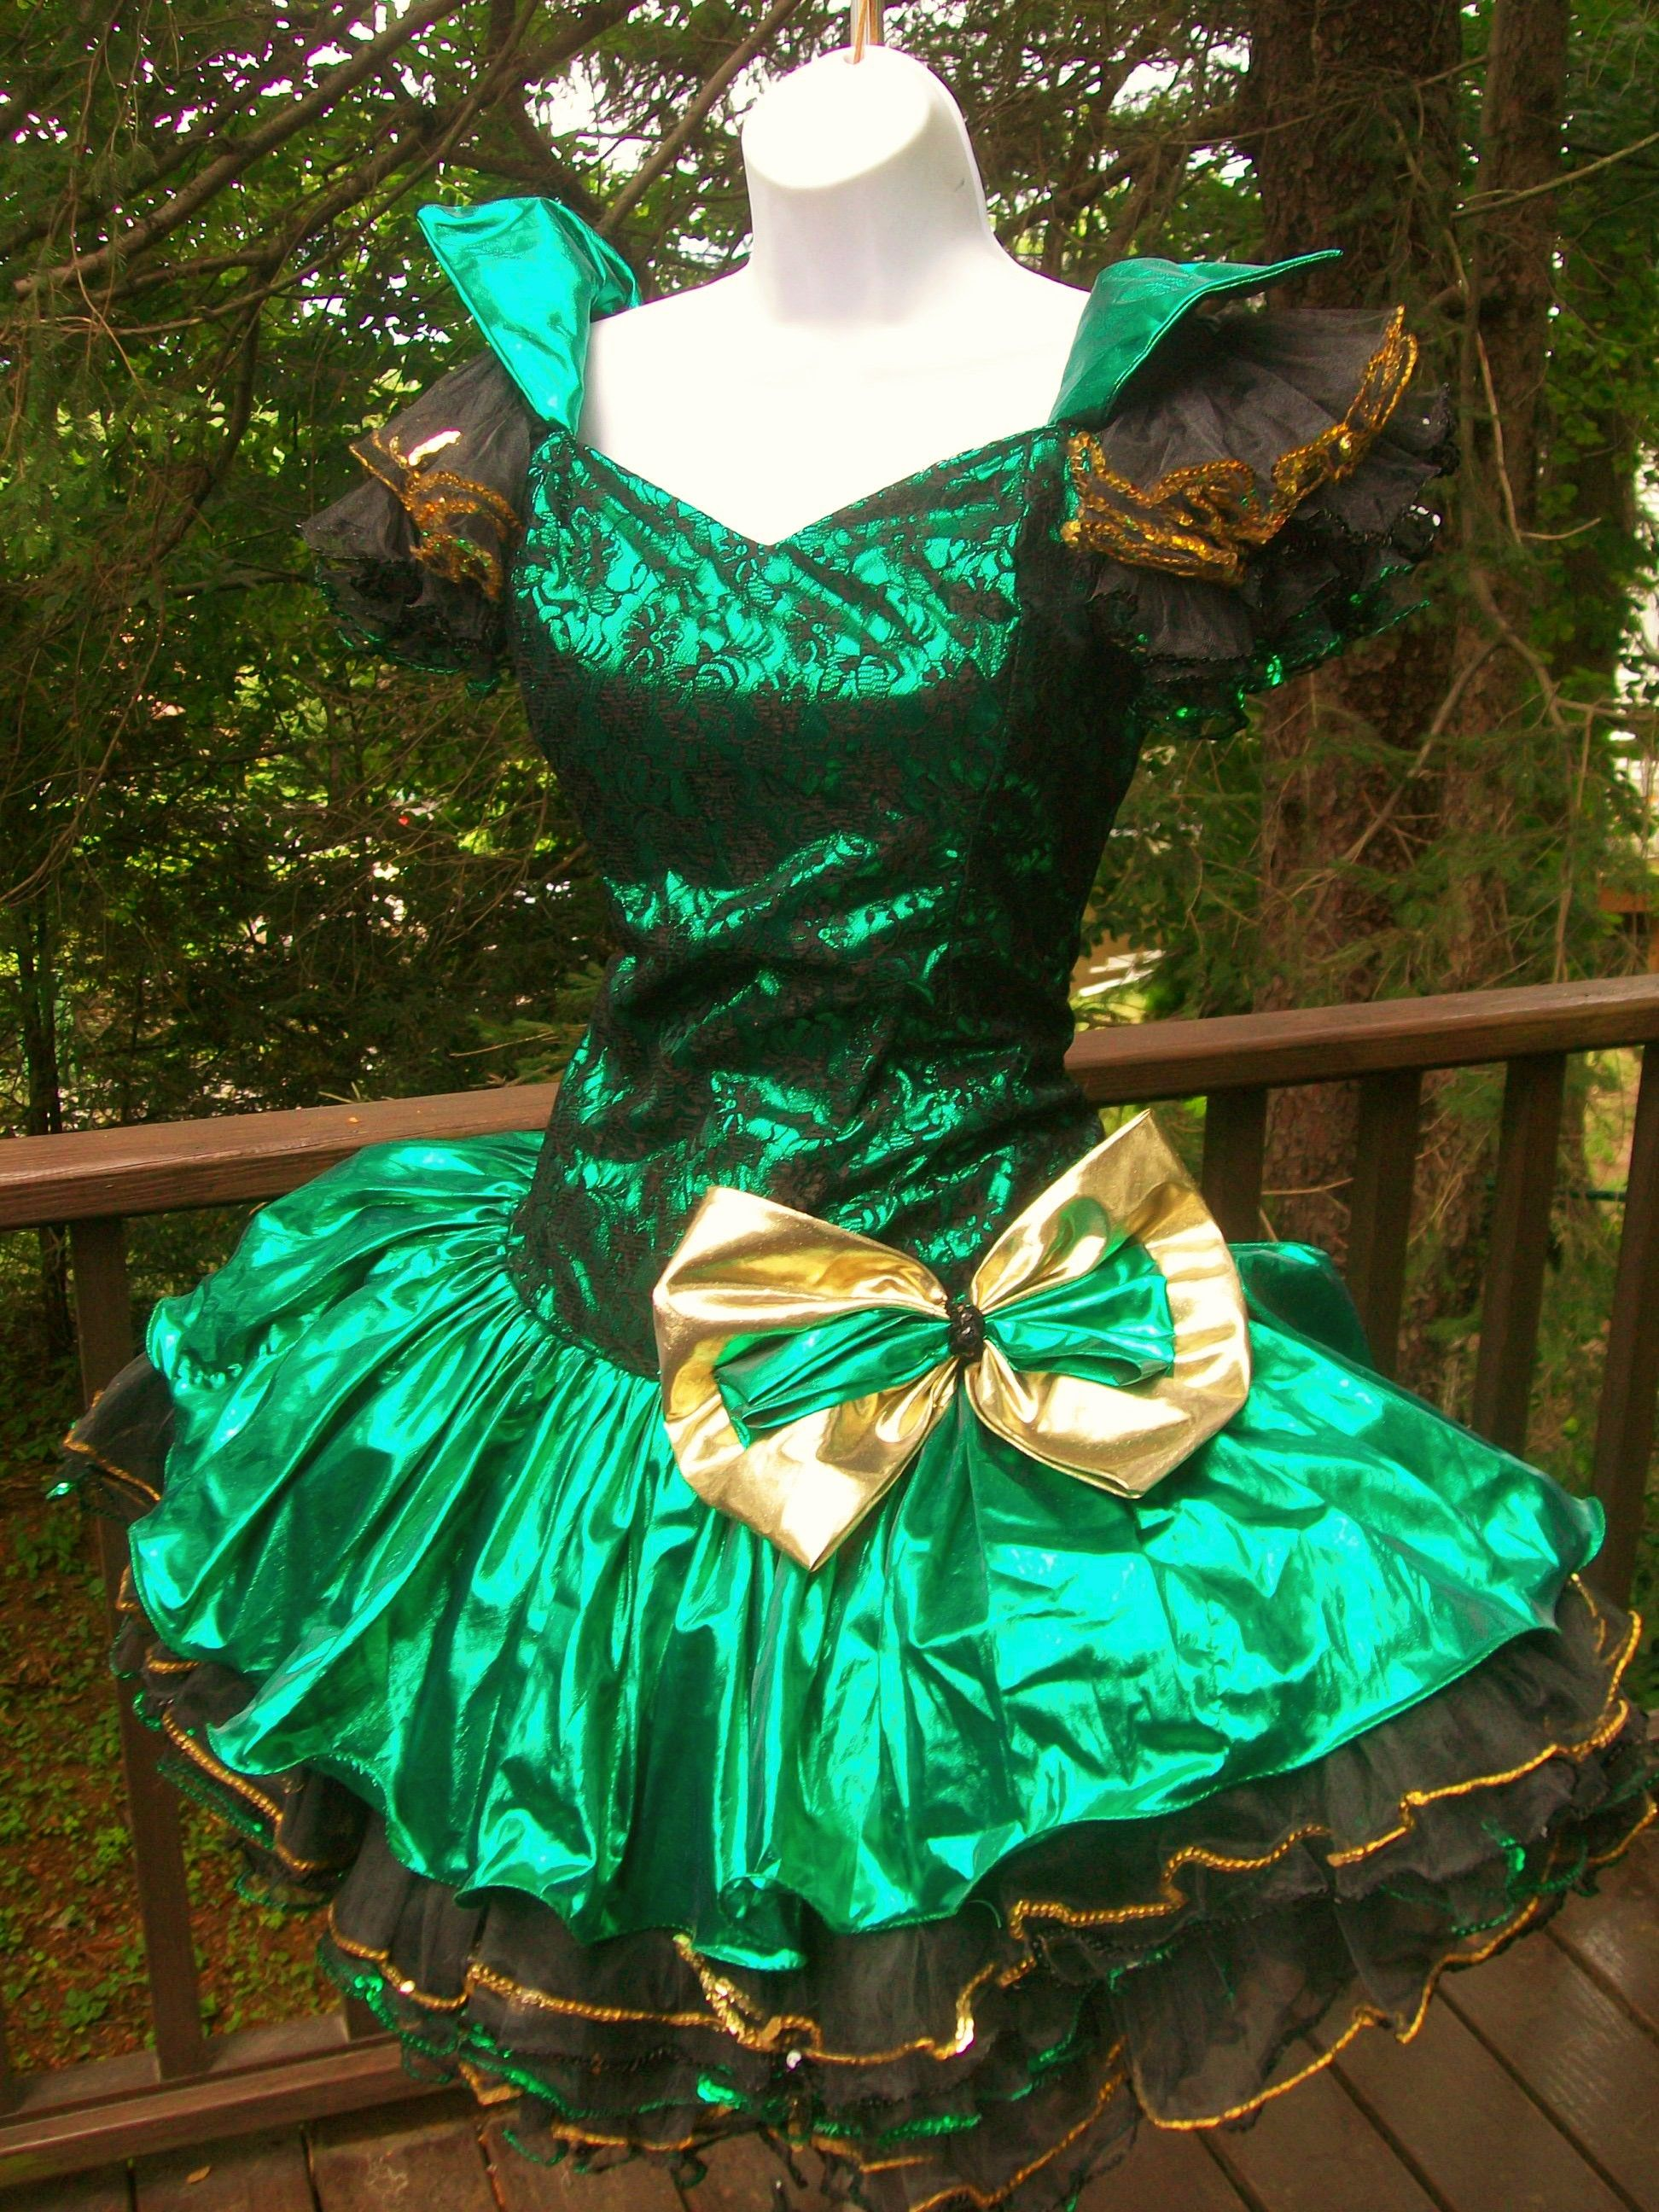 S prom dress us pinterest prom dresses dresses and prom